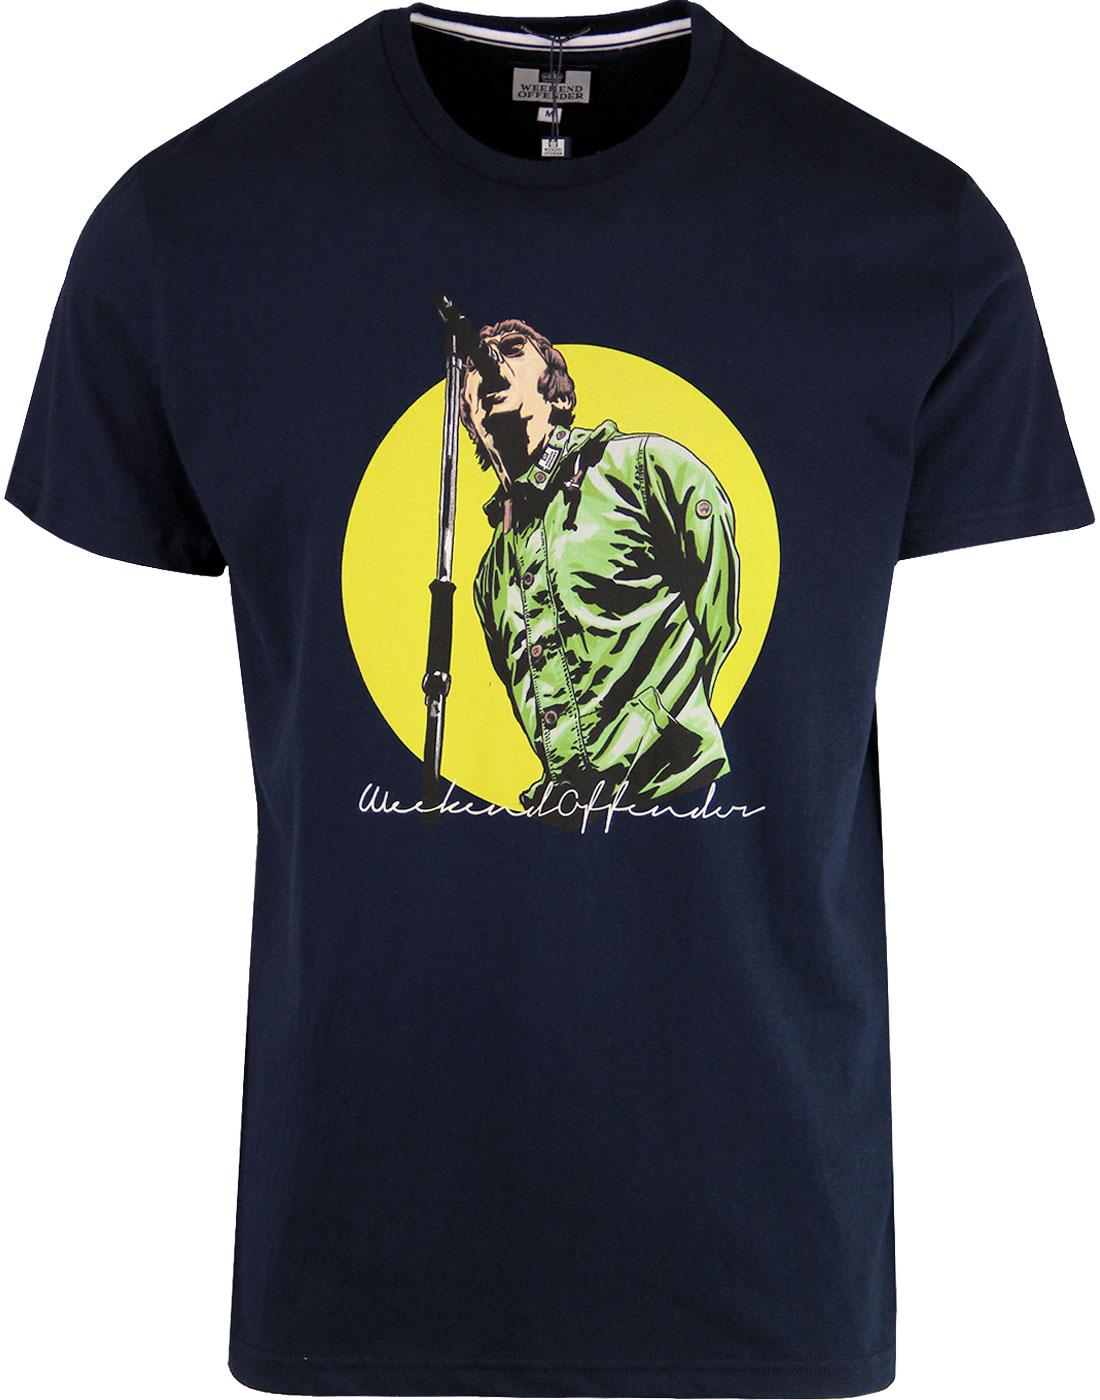 Liam WEEKEND OFFENDER Liam Gallagher 90s Tee NAVY